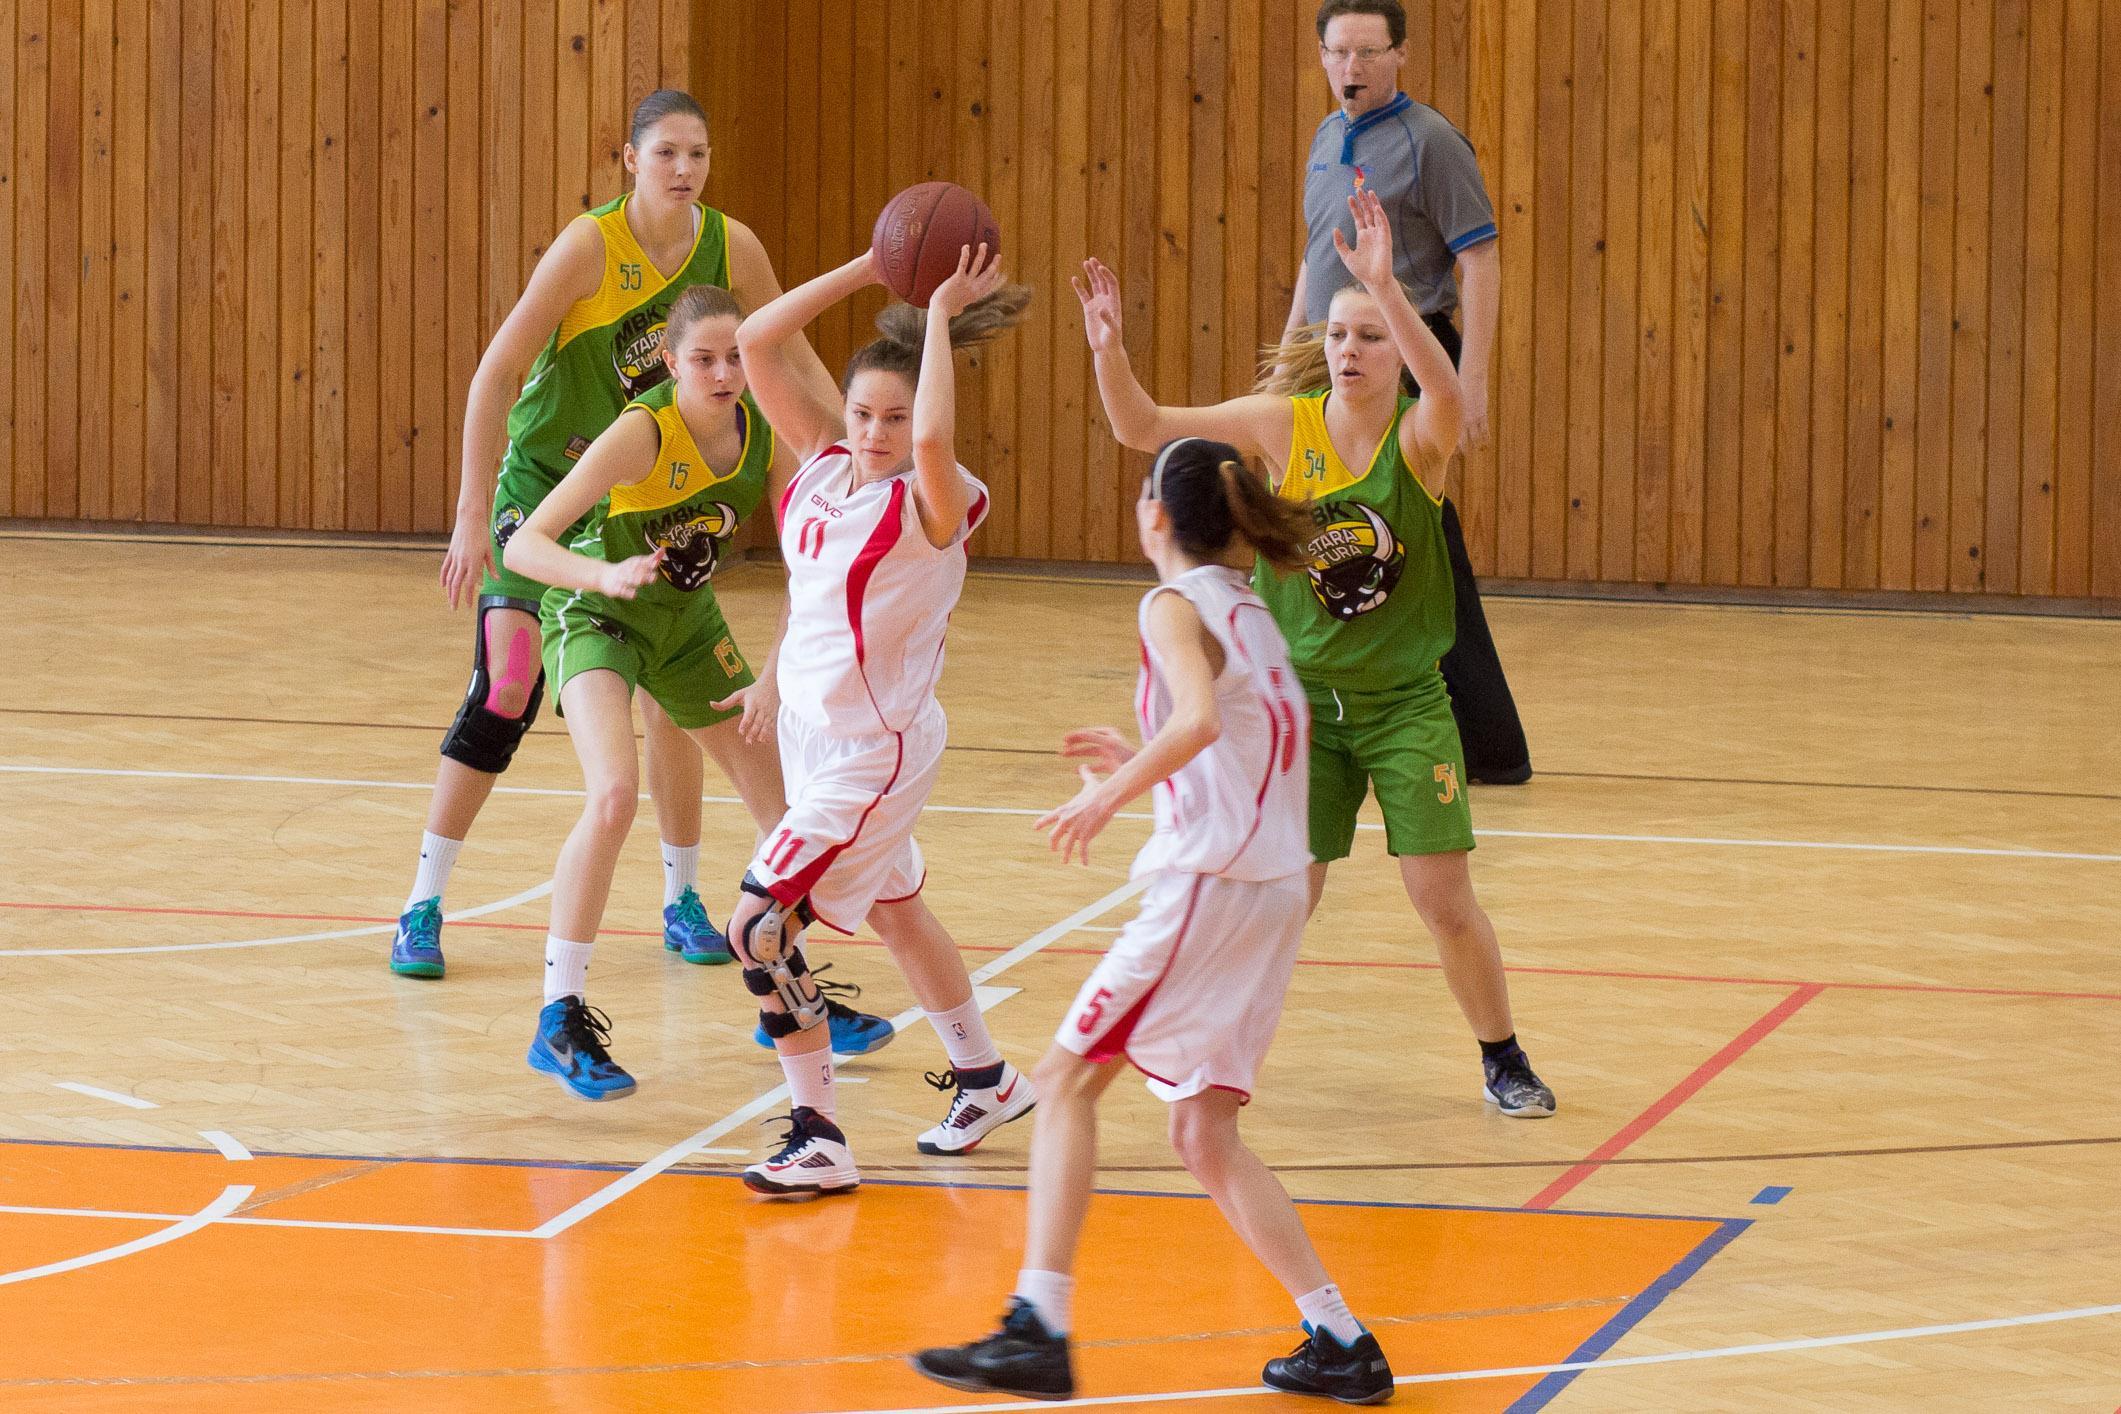 bk-zvolen-mbk-stara-tura-2014-basketbal-3